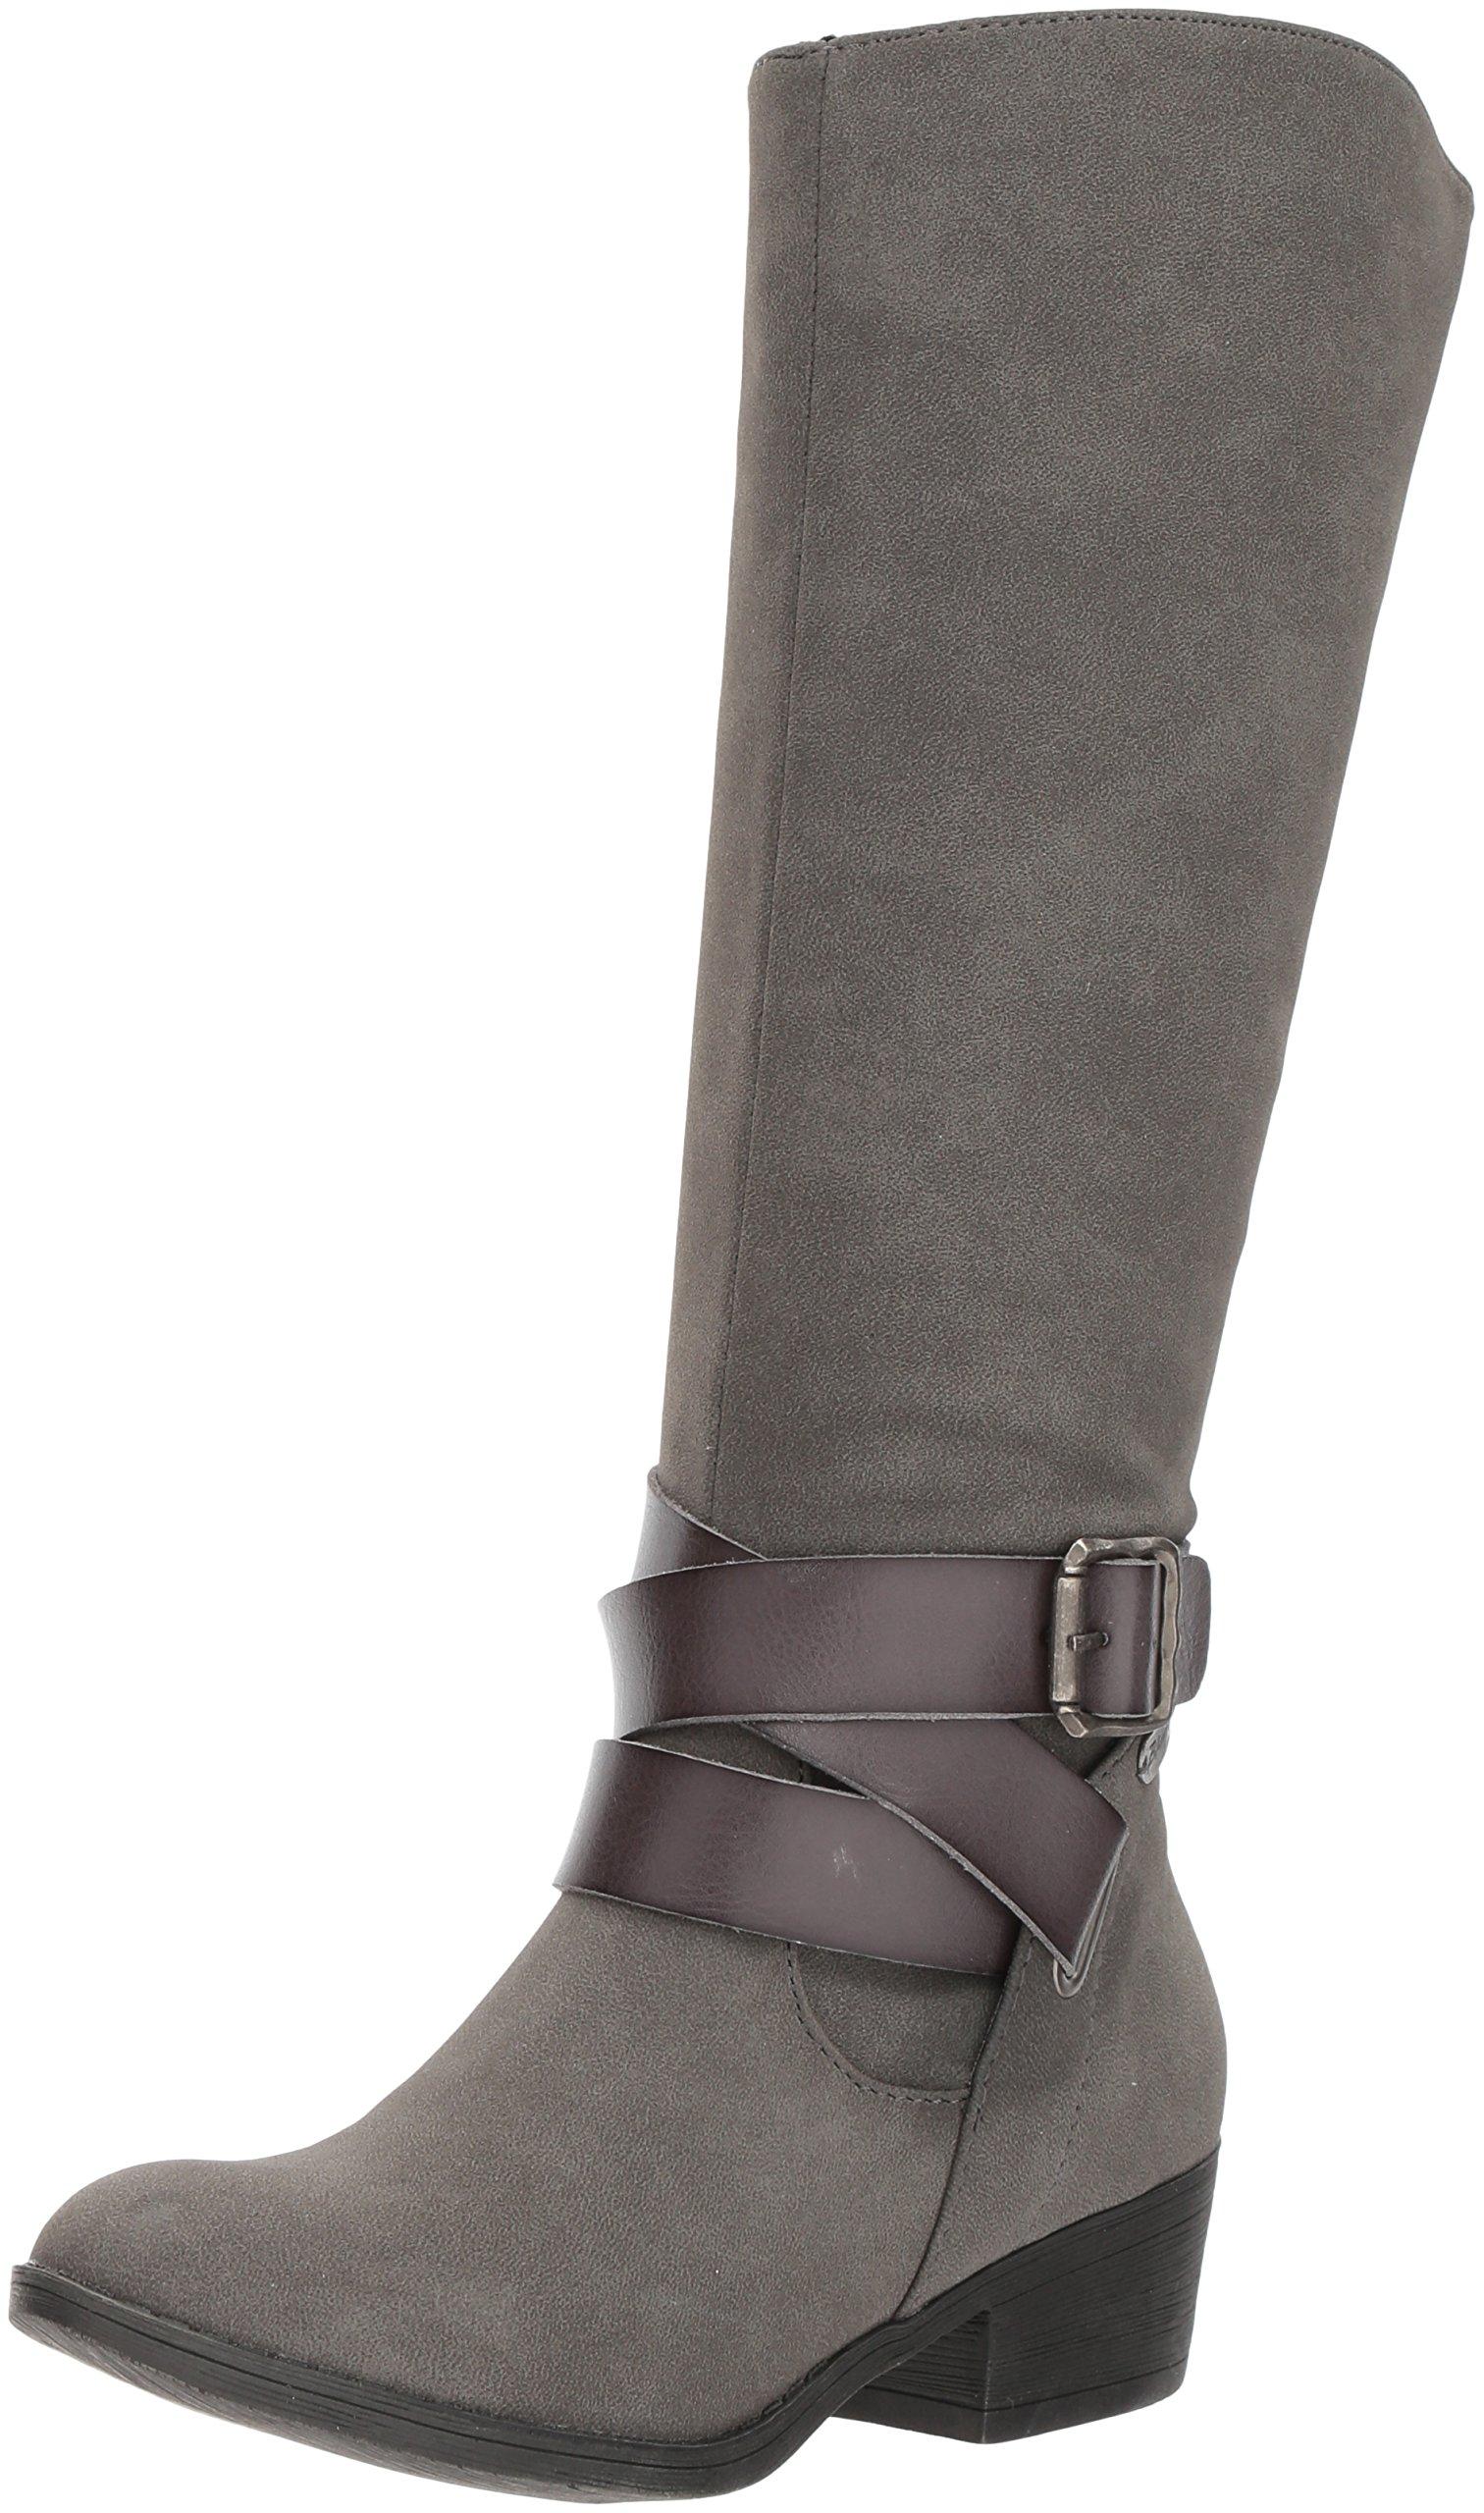 Blowfish Women's Sharpshooter Boot, Grey Sport Suede/Gunmetal Dyecut, 10 M US